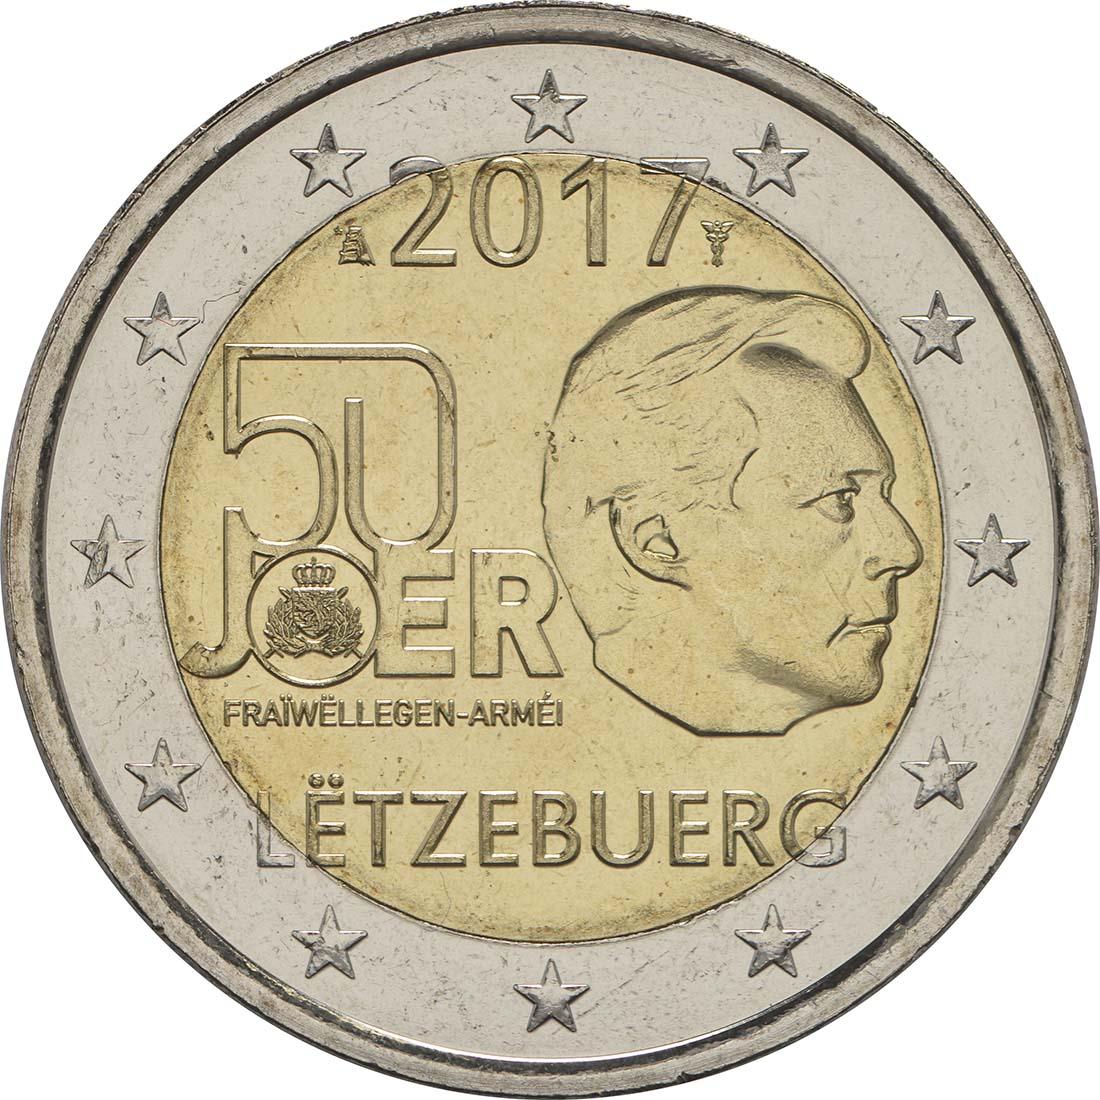 2017 264 Luxemburg Freiwilligenarmee.jpg